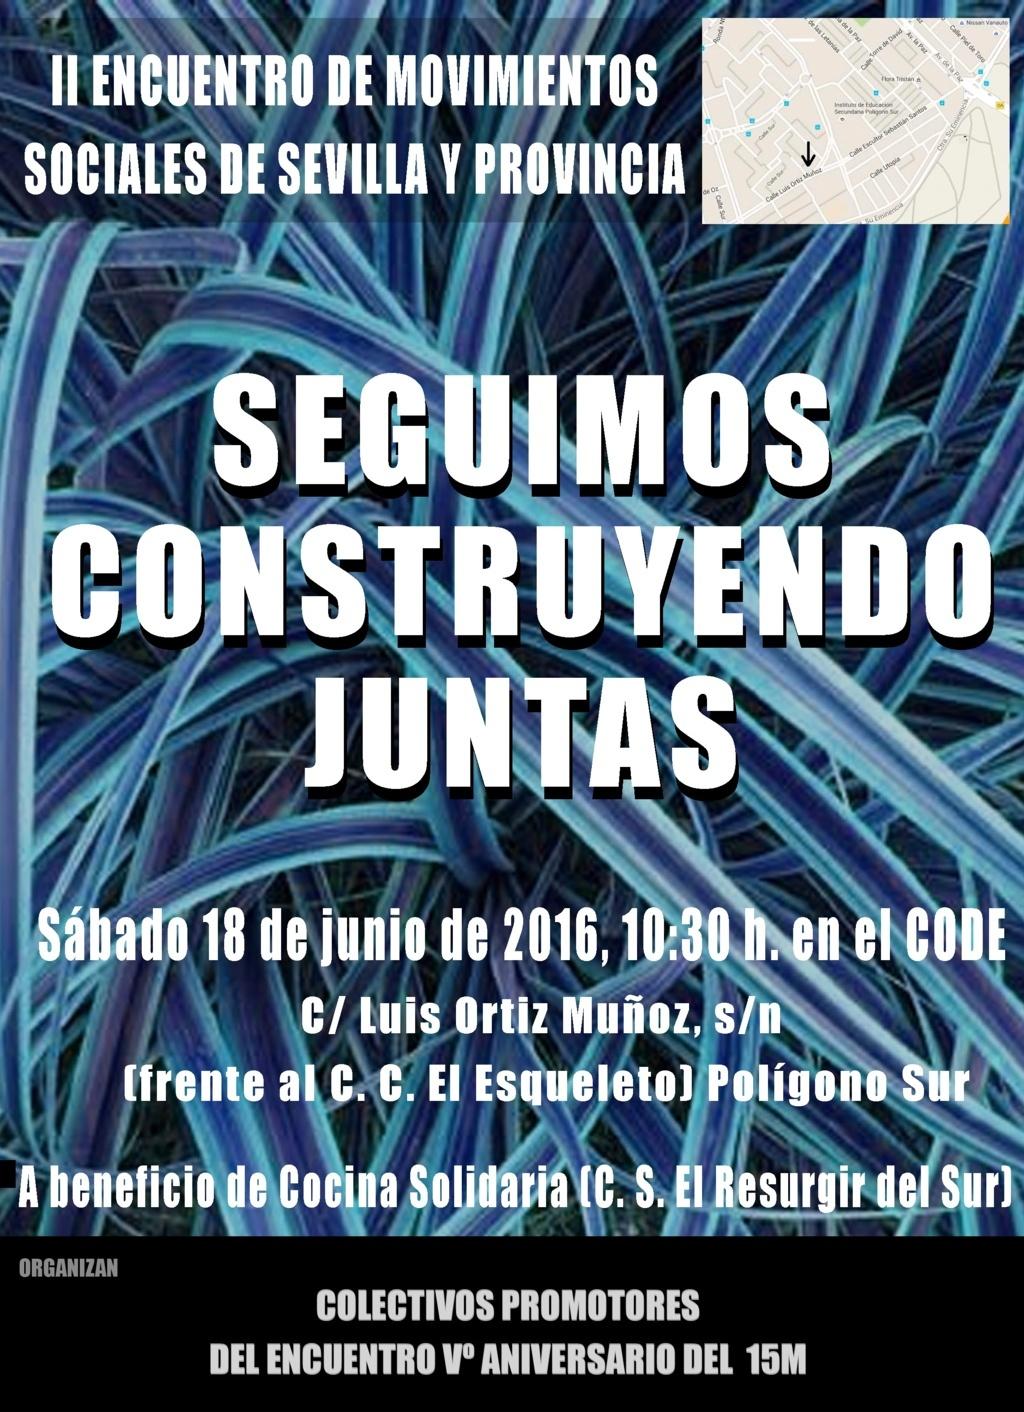 II Encuentro MMSS_Sevilla y Prov_2 (FILEminimizer)